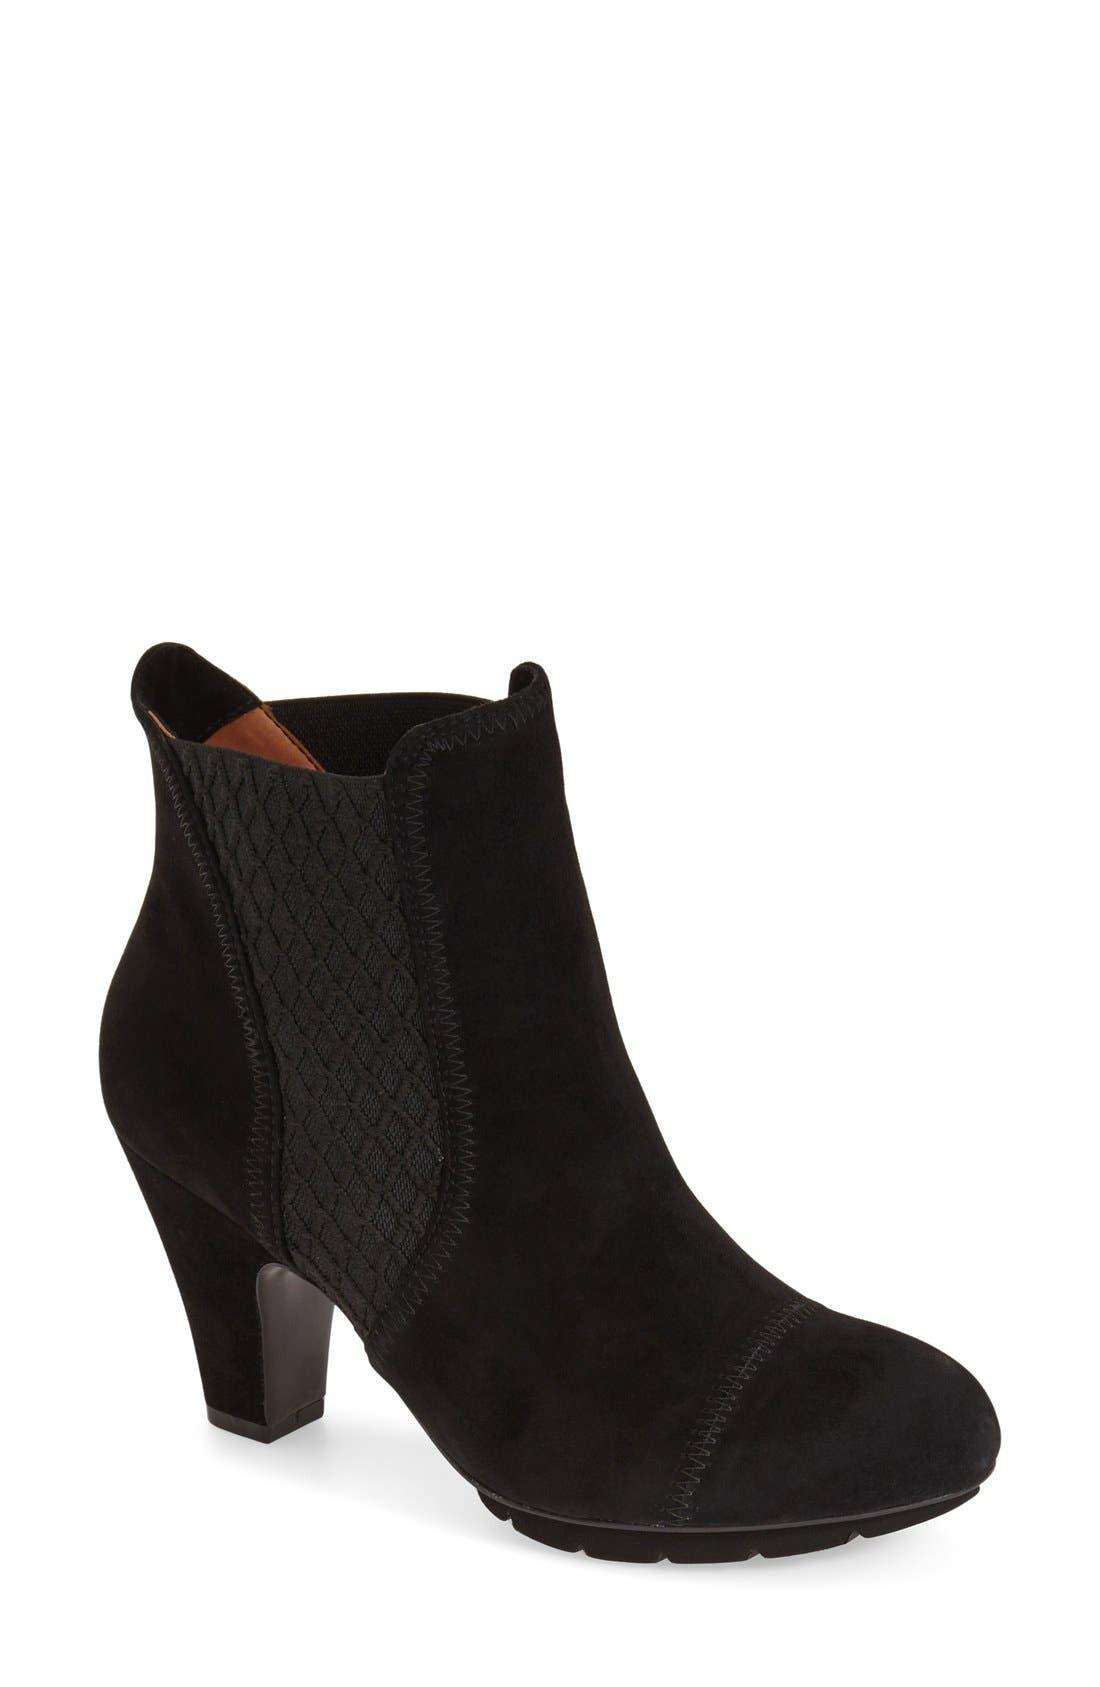 L'Amourdes Pieds'Faaris' Chelsea Boot,                         Main,                         color, 001